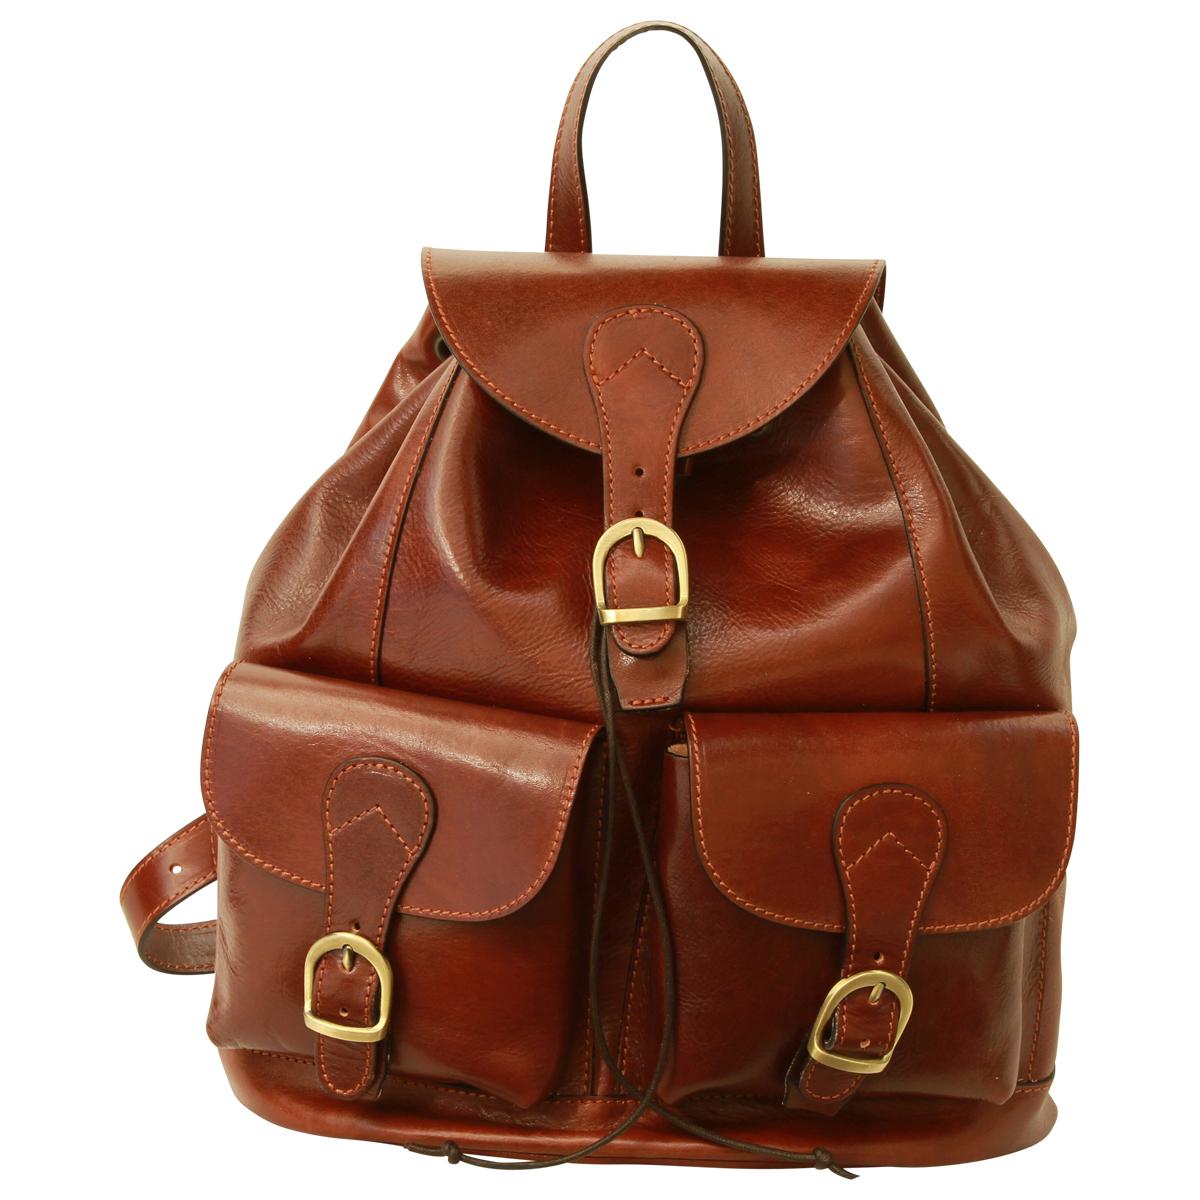 Old Angler Toscana Collection Ryggsäck Leather Backpack 1093 ... 2210b2ab34105